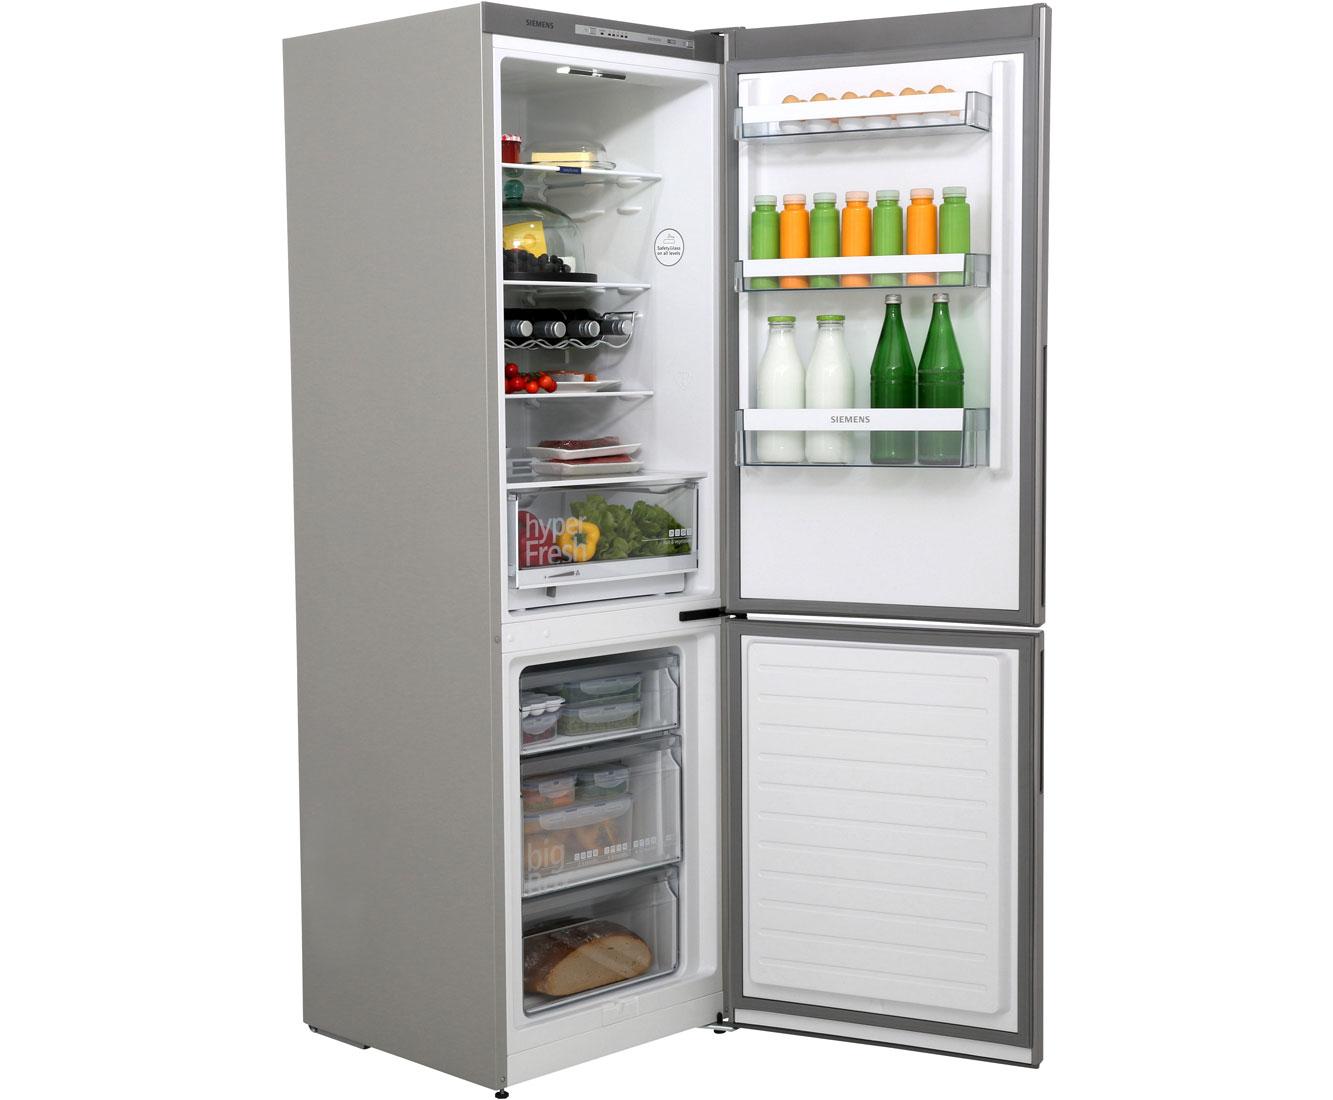 Siemens Kühlschrank Brummt : Siemens kühlschrank brummt sehr laut kühlschrank pfeift woran